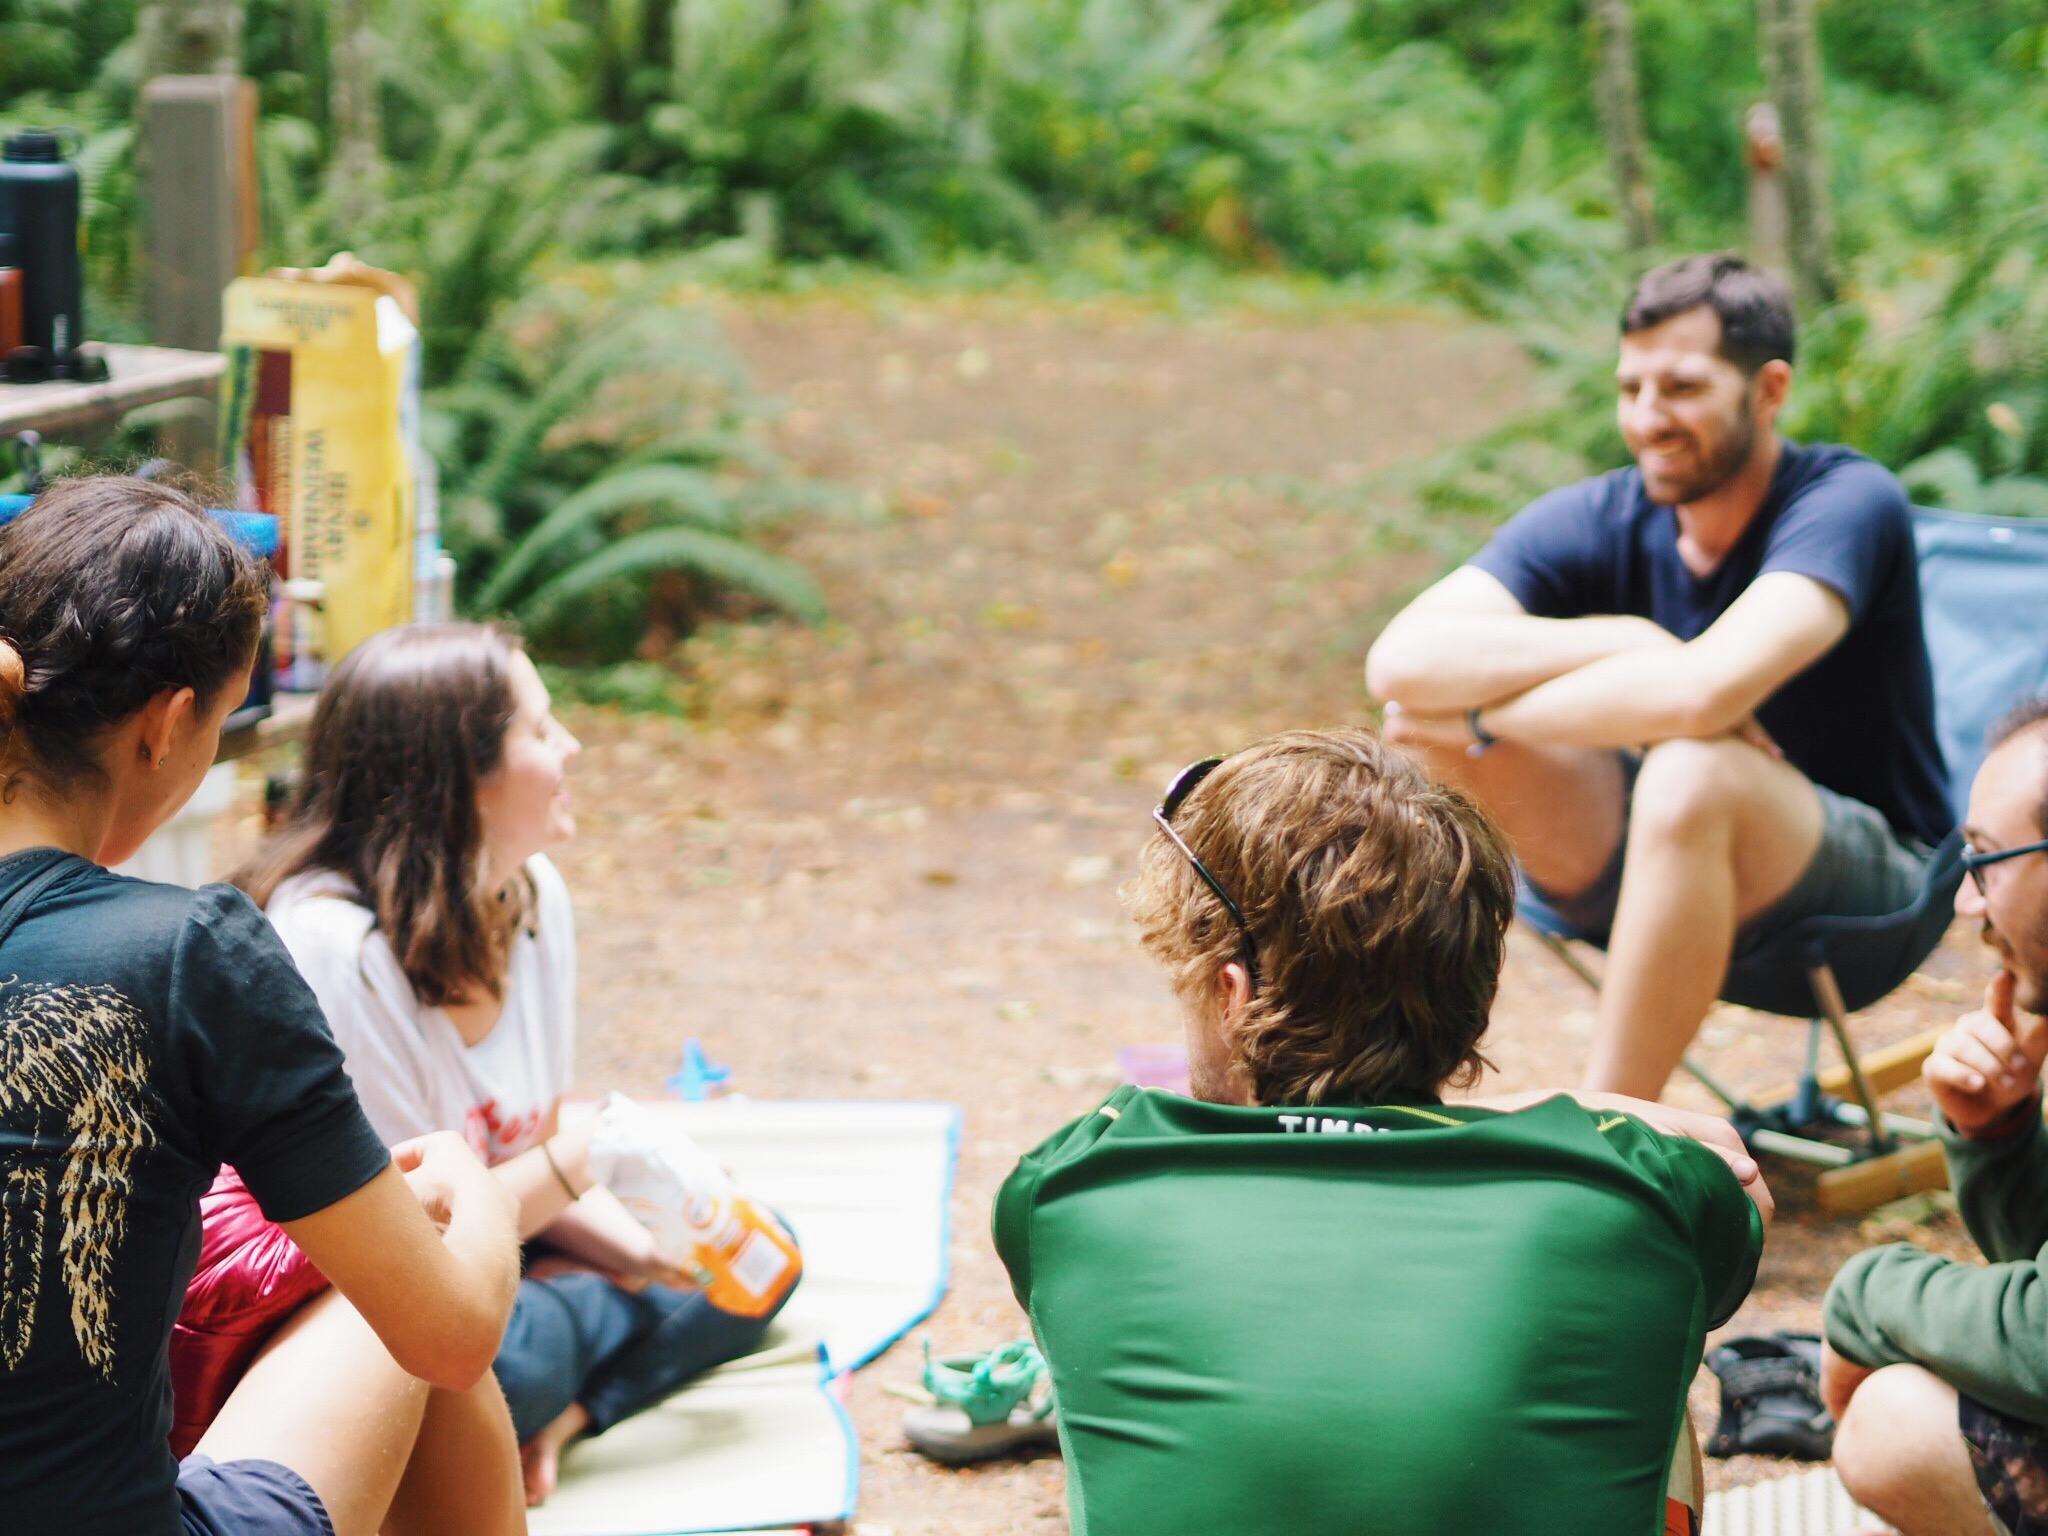 camping, oregon, friends